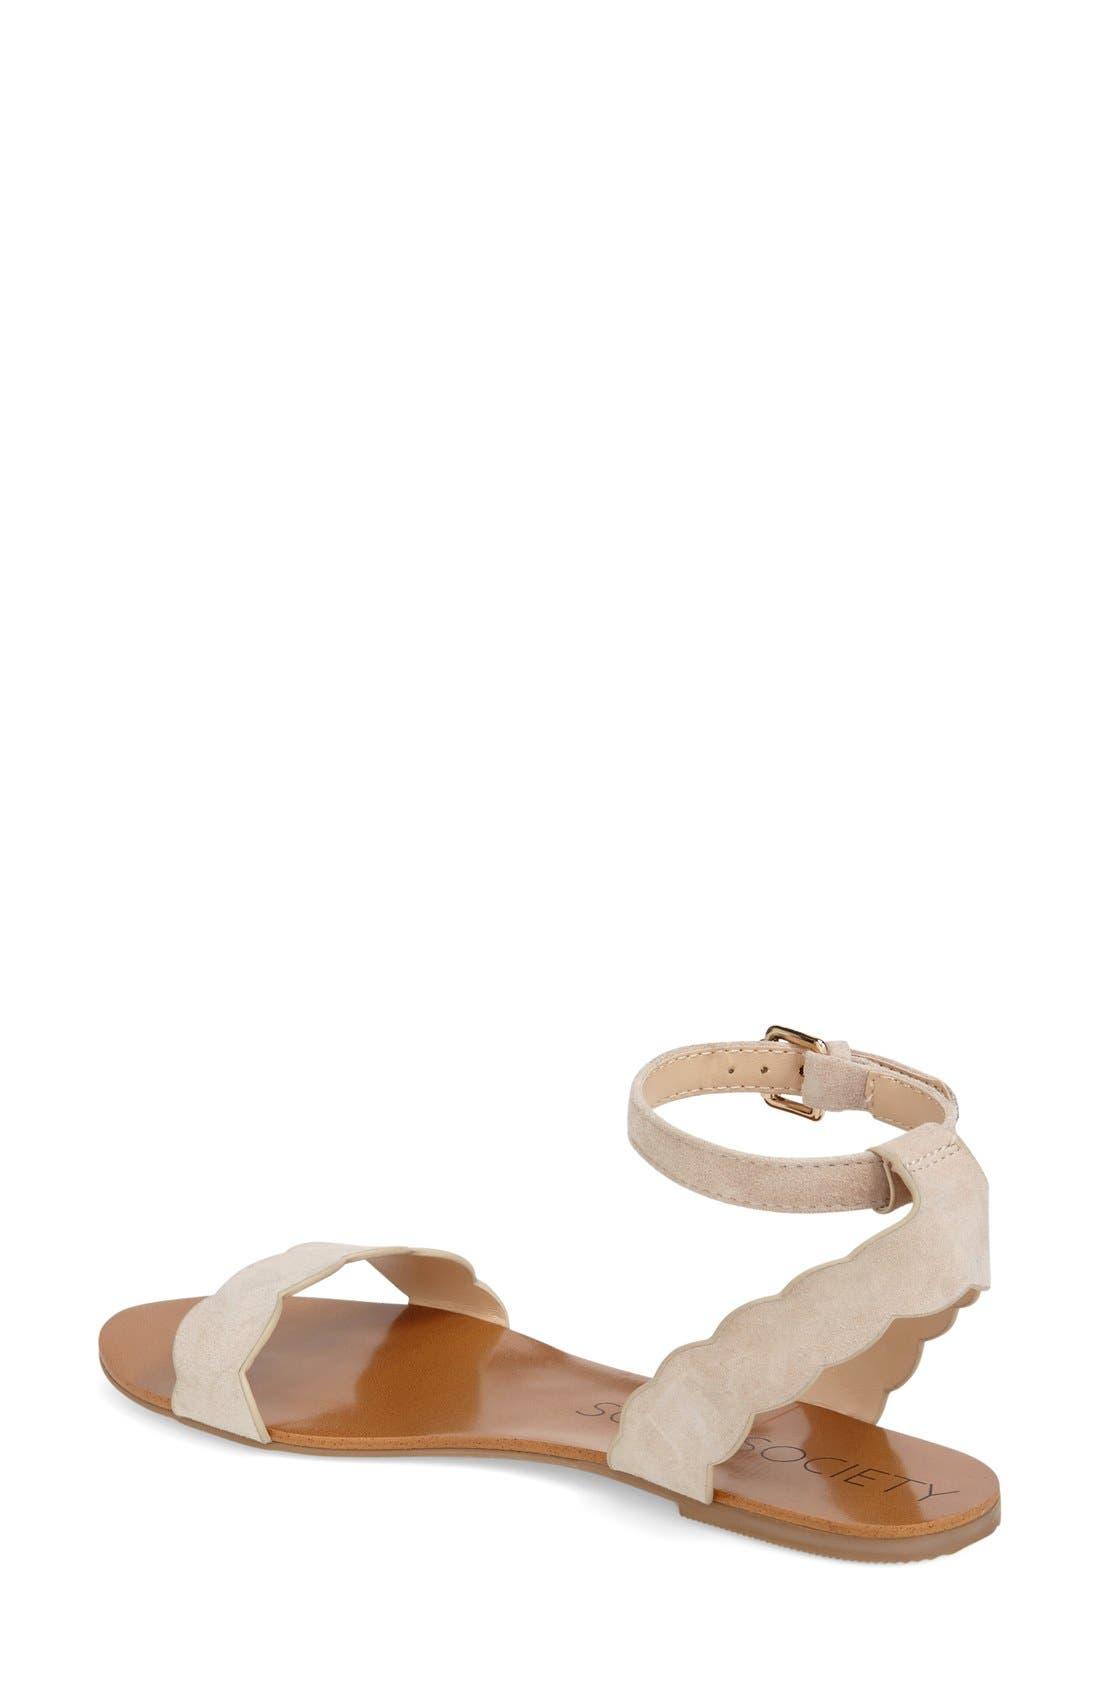 'Odette' Scalloped Ankle Strap Flat Sandal,                             Alternate thumbnail 19, color,